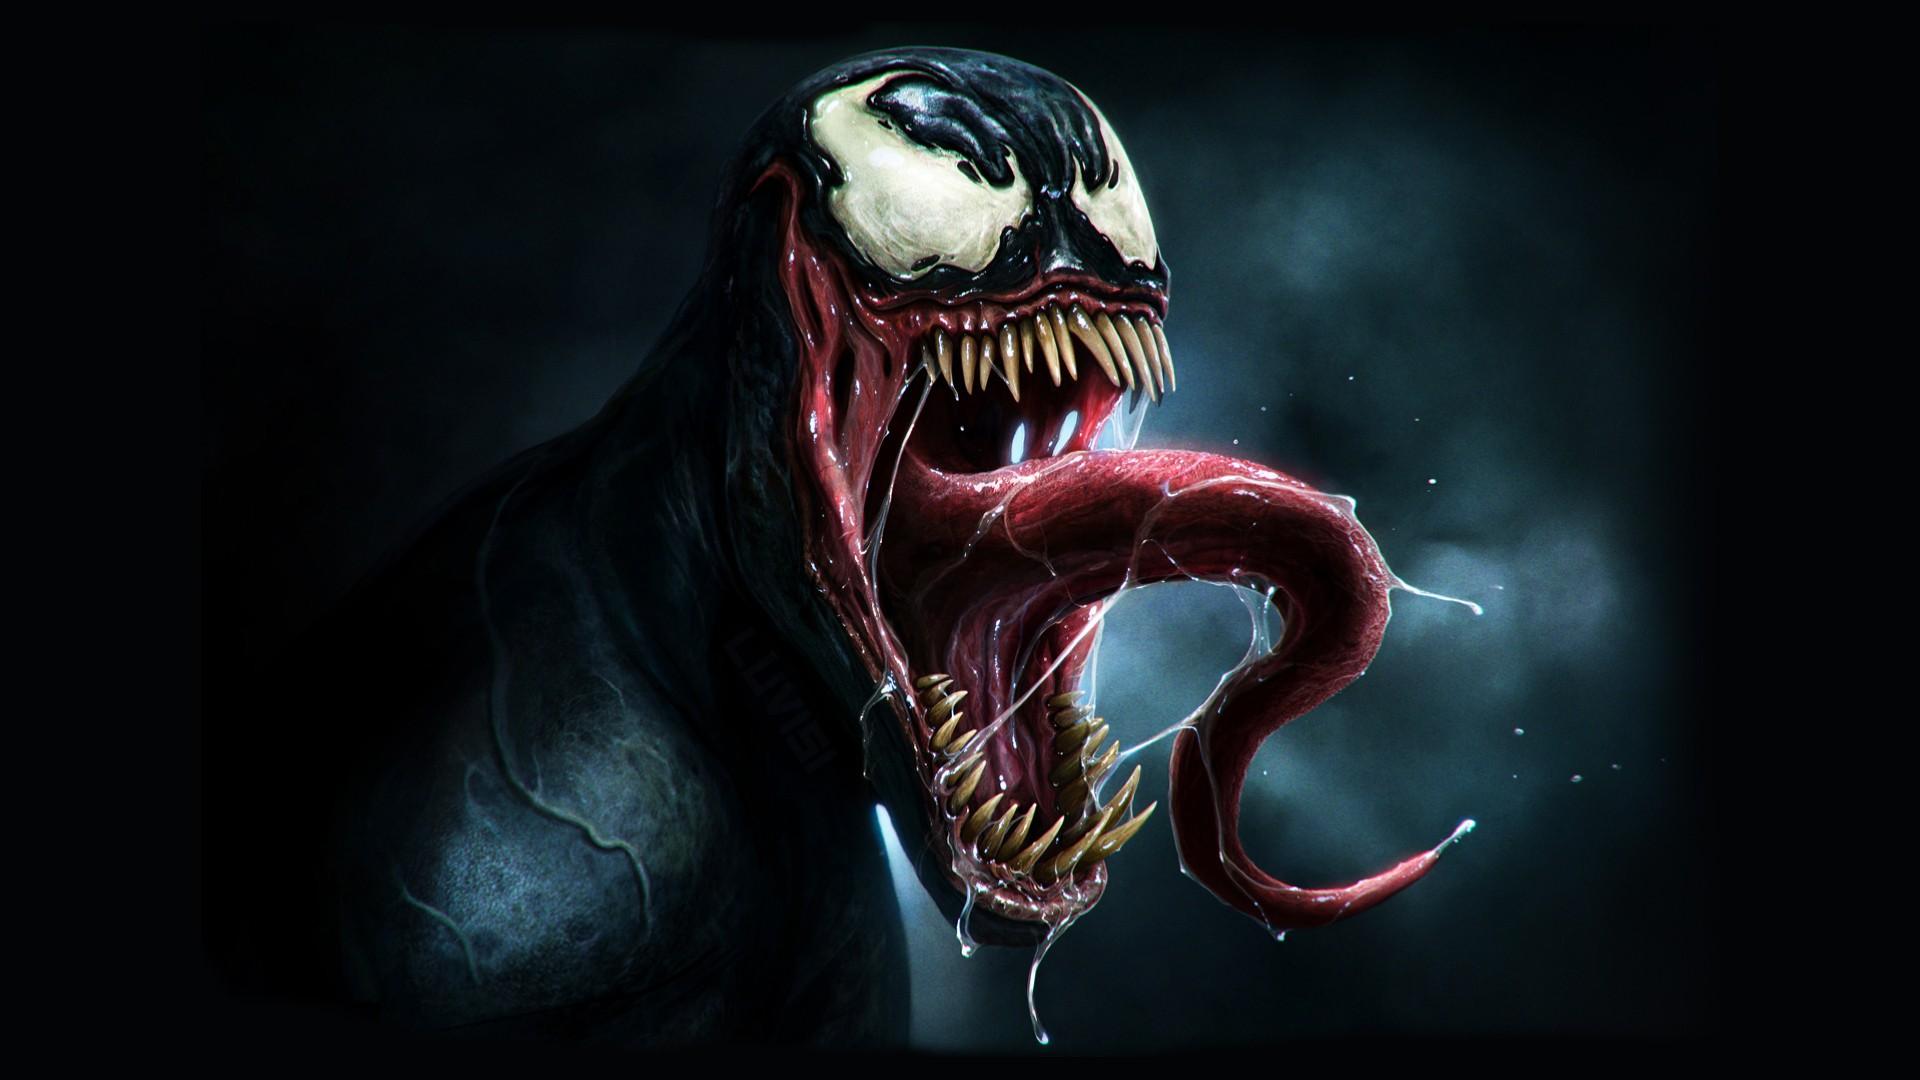 Venom movie background 7